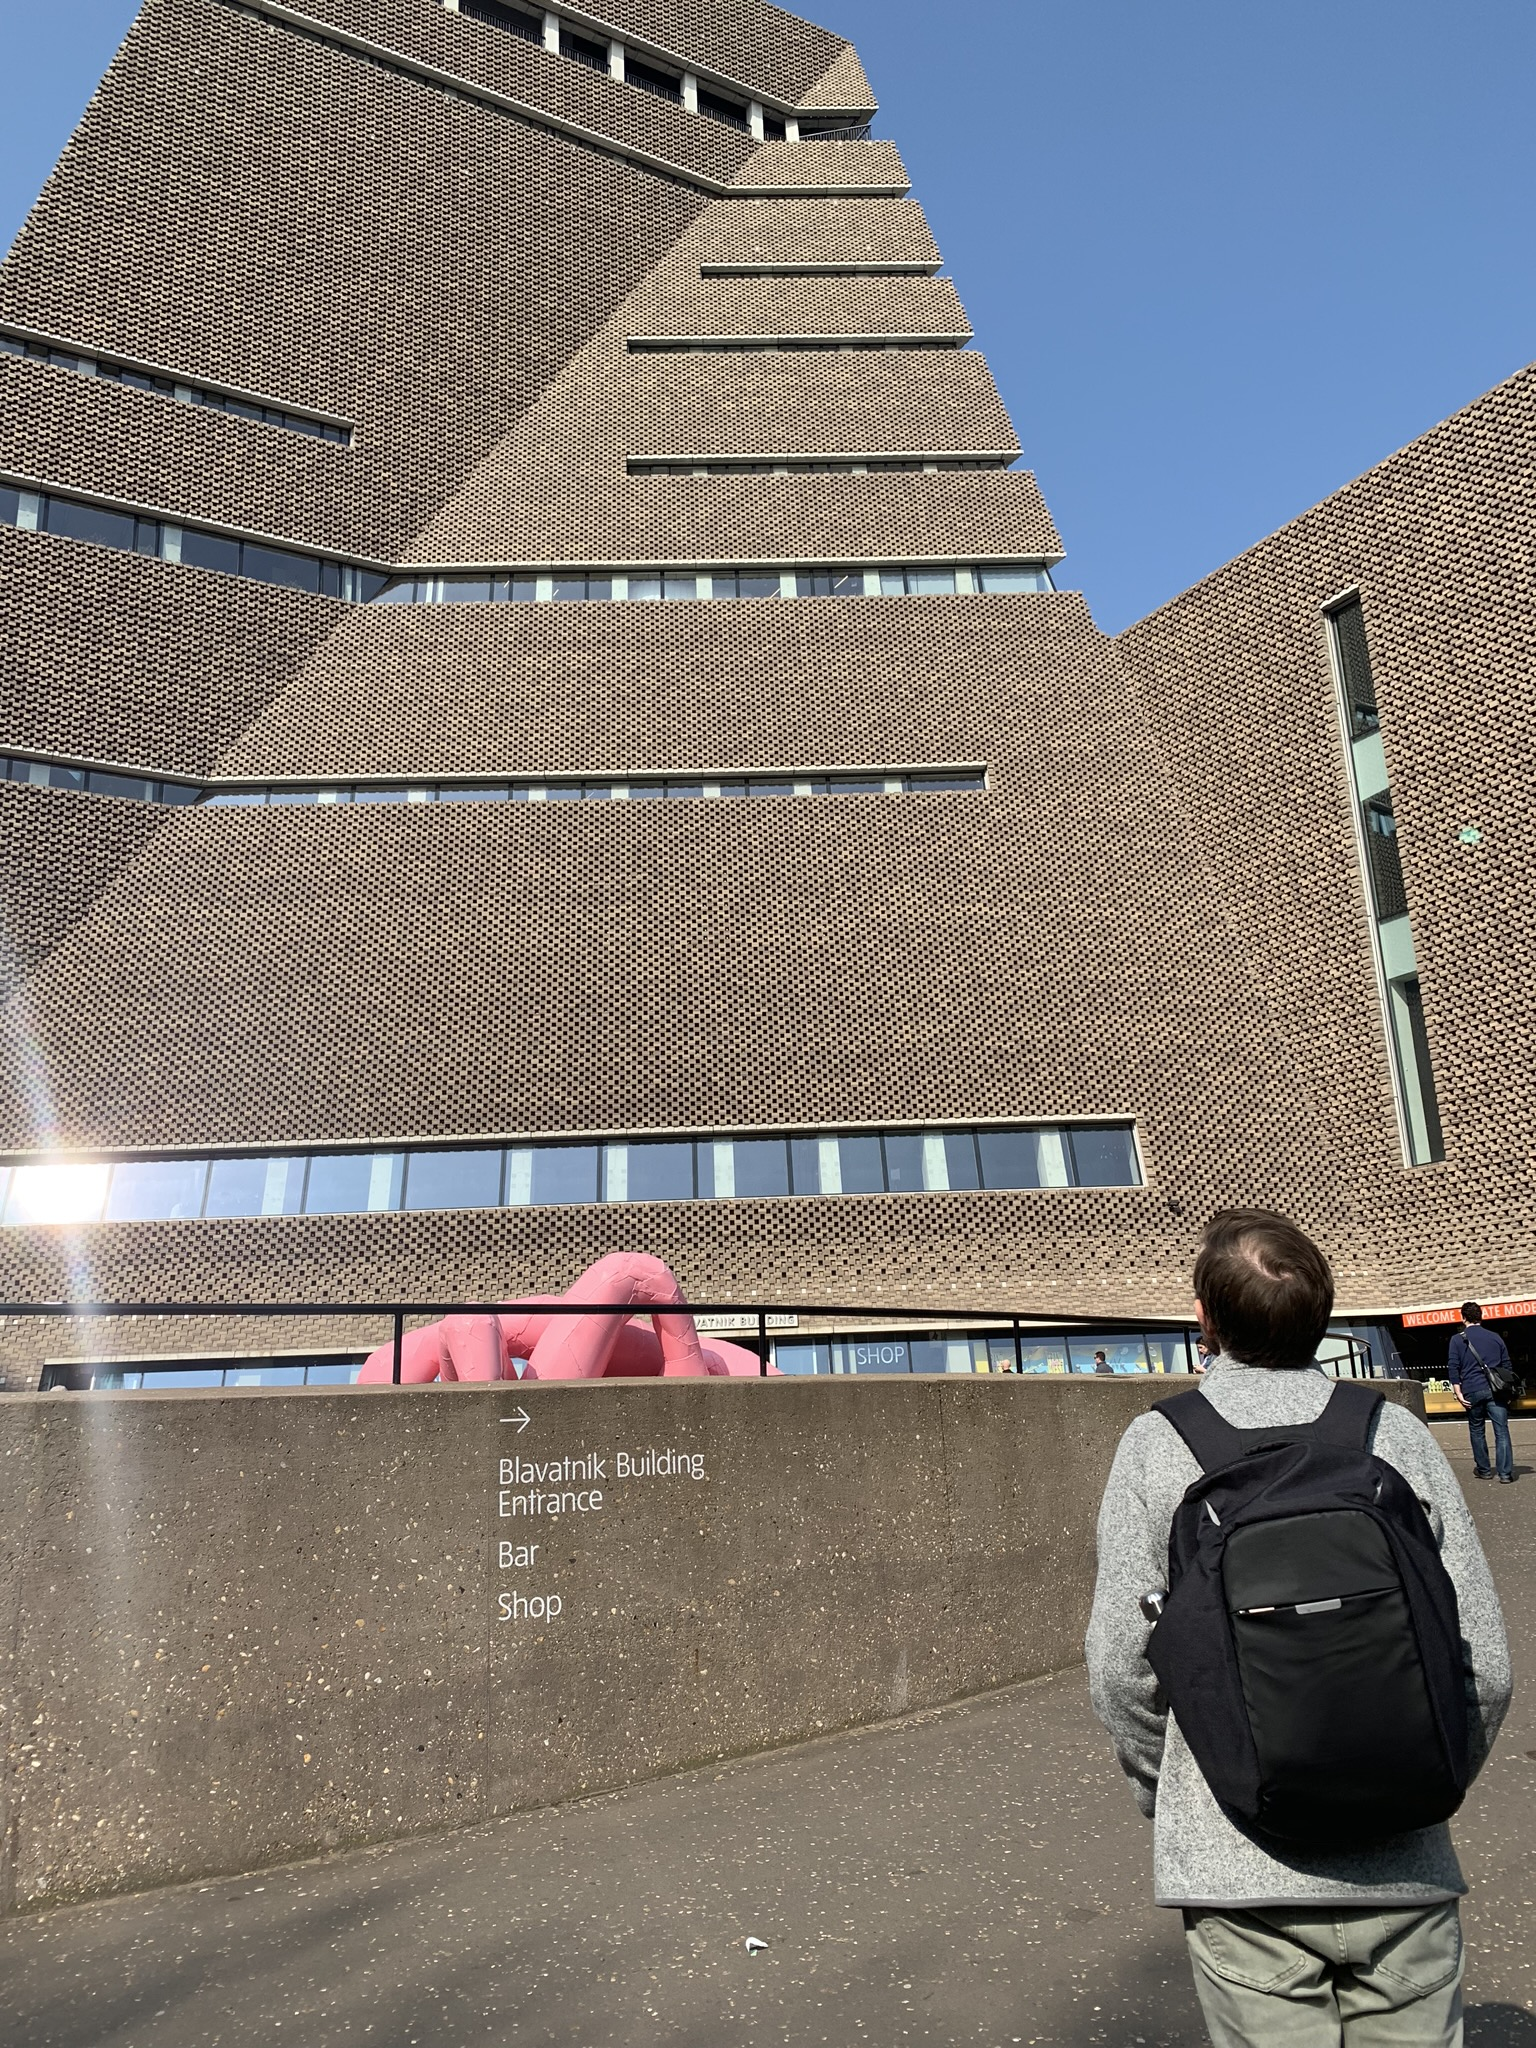 Entering the Tate Modern